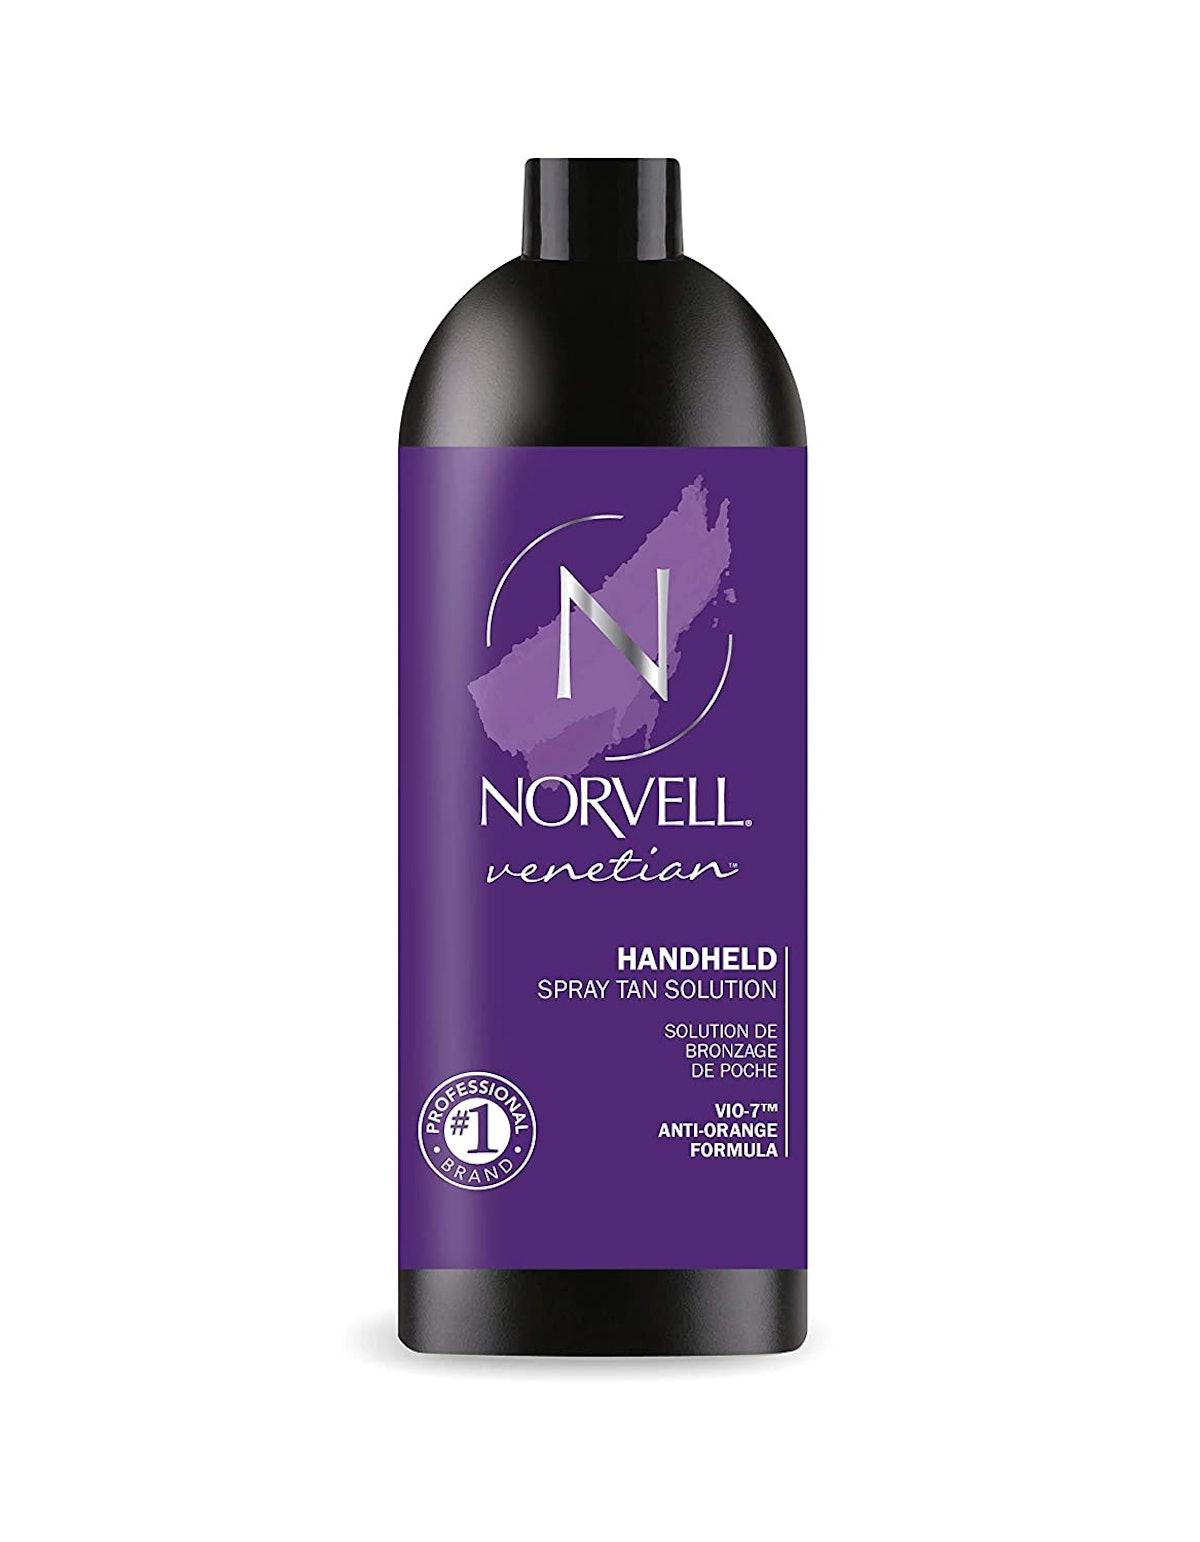 Norvell Venetian Handheld Spray Tan Solution (34 Ounces)